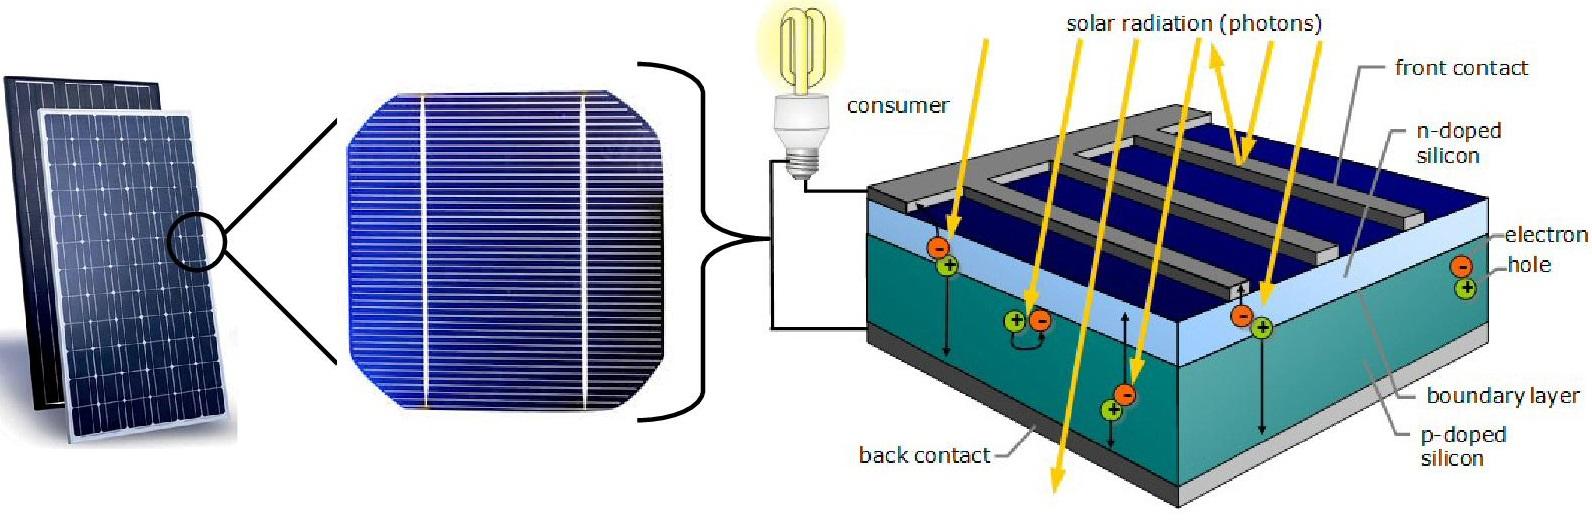 About Photovoltaic Pv Solar Panel Diagram Source Http Volker Quaschningde Articles Basics